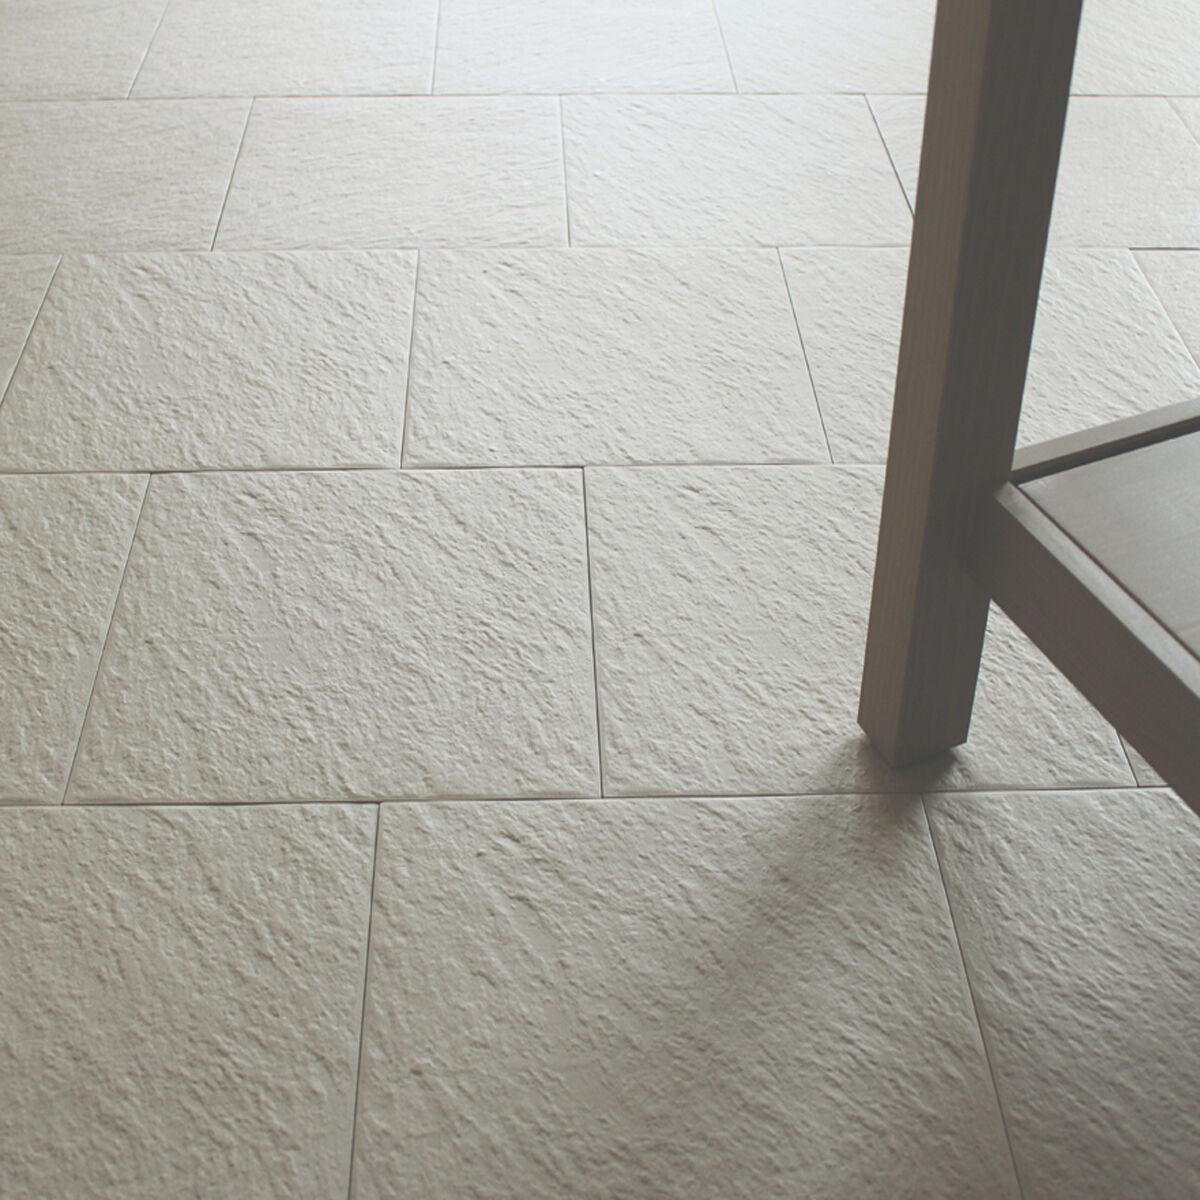 30x30cm beige porcelain anti slip riven floor tiles adhesive 30x30cm beige porcelain anti slip riven floor tiles adhesive grout 10 20sqm dailygadgetfo Images